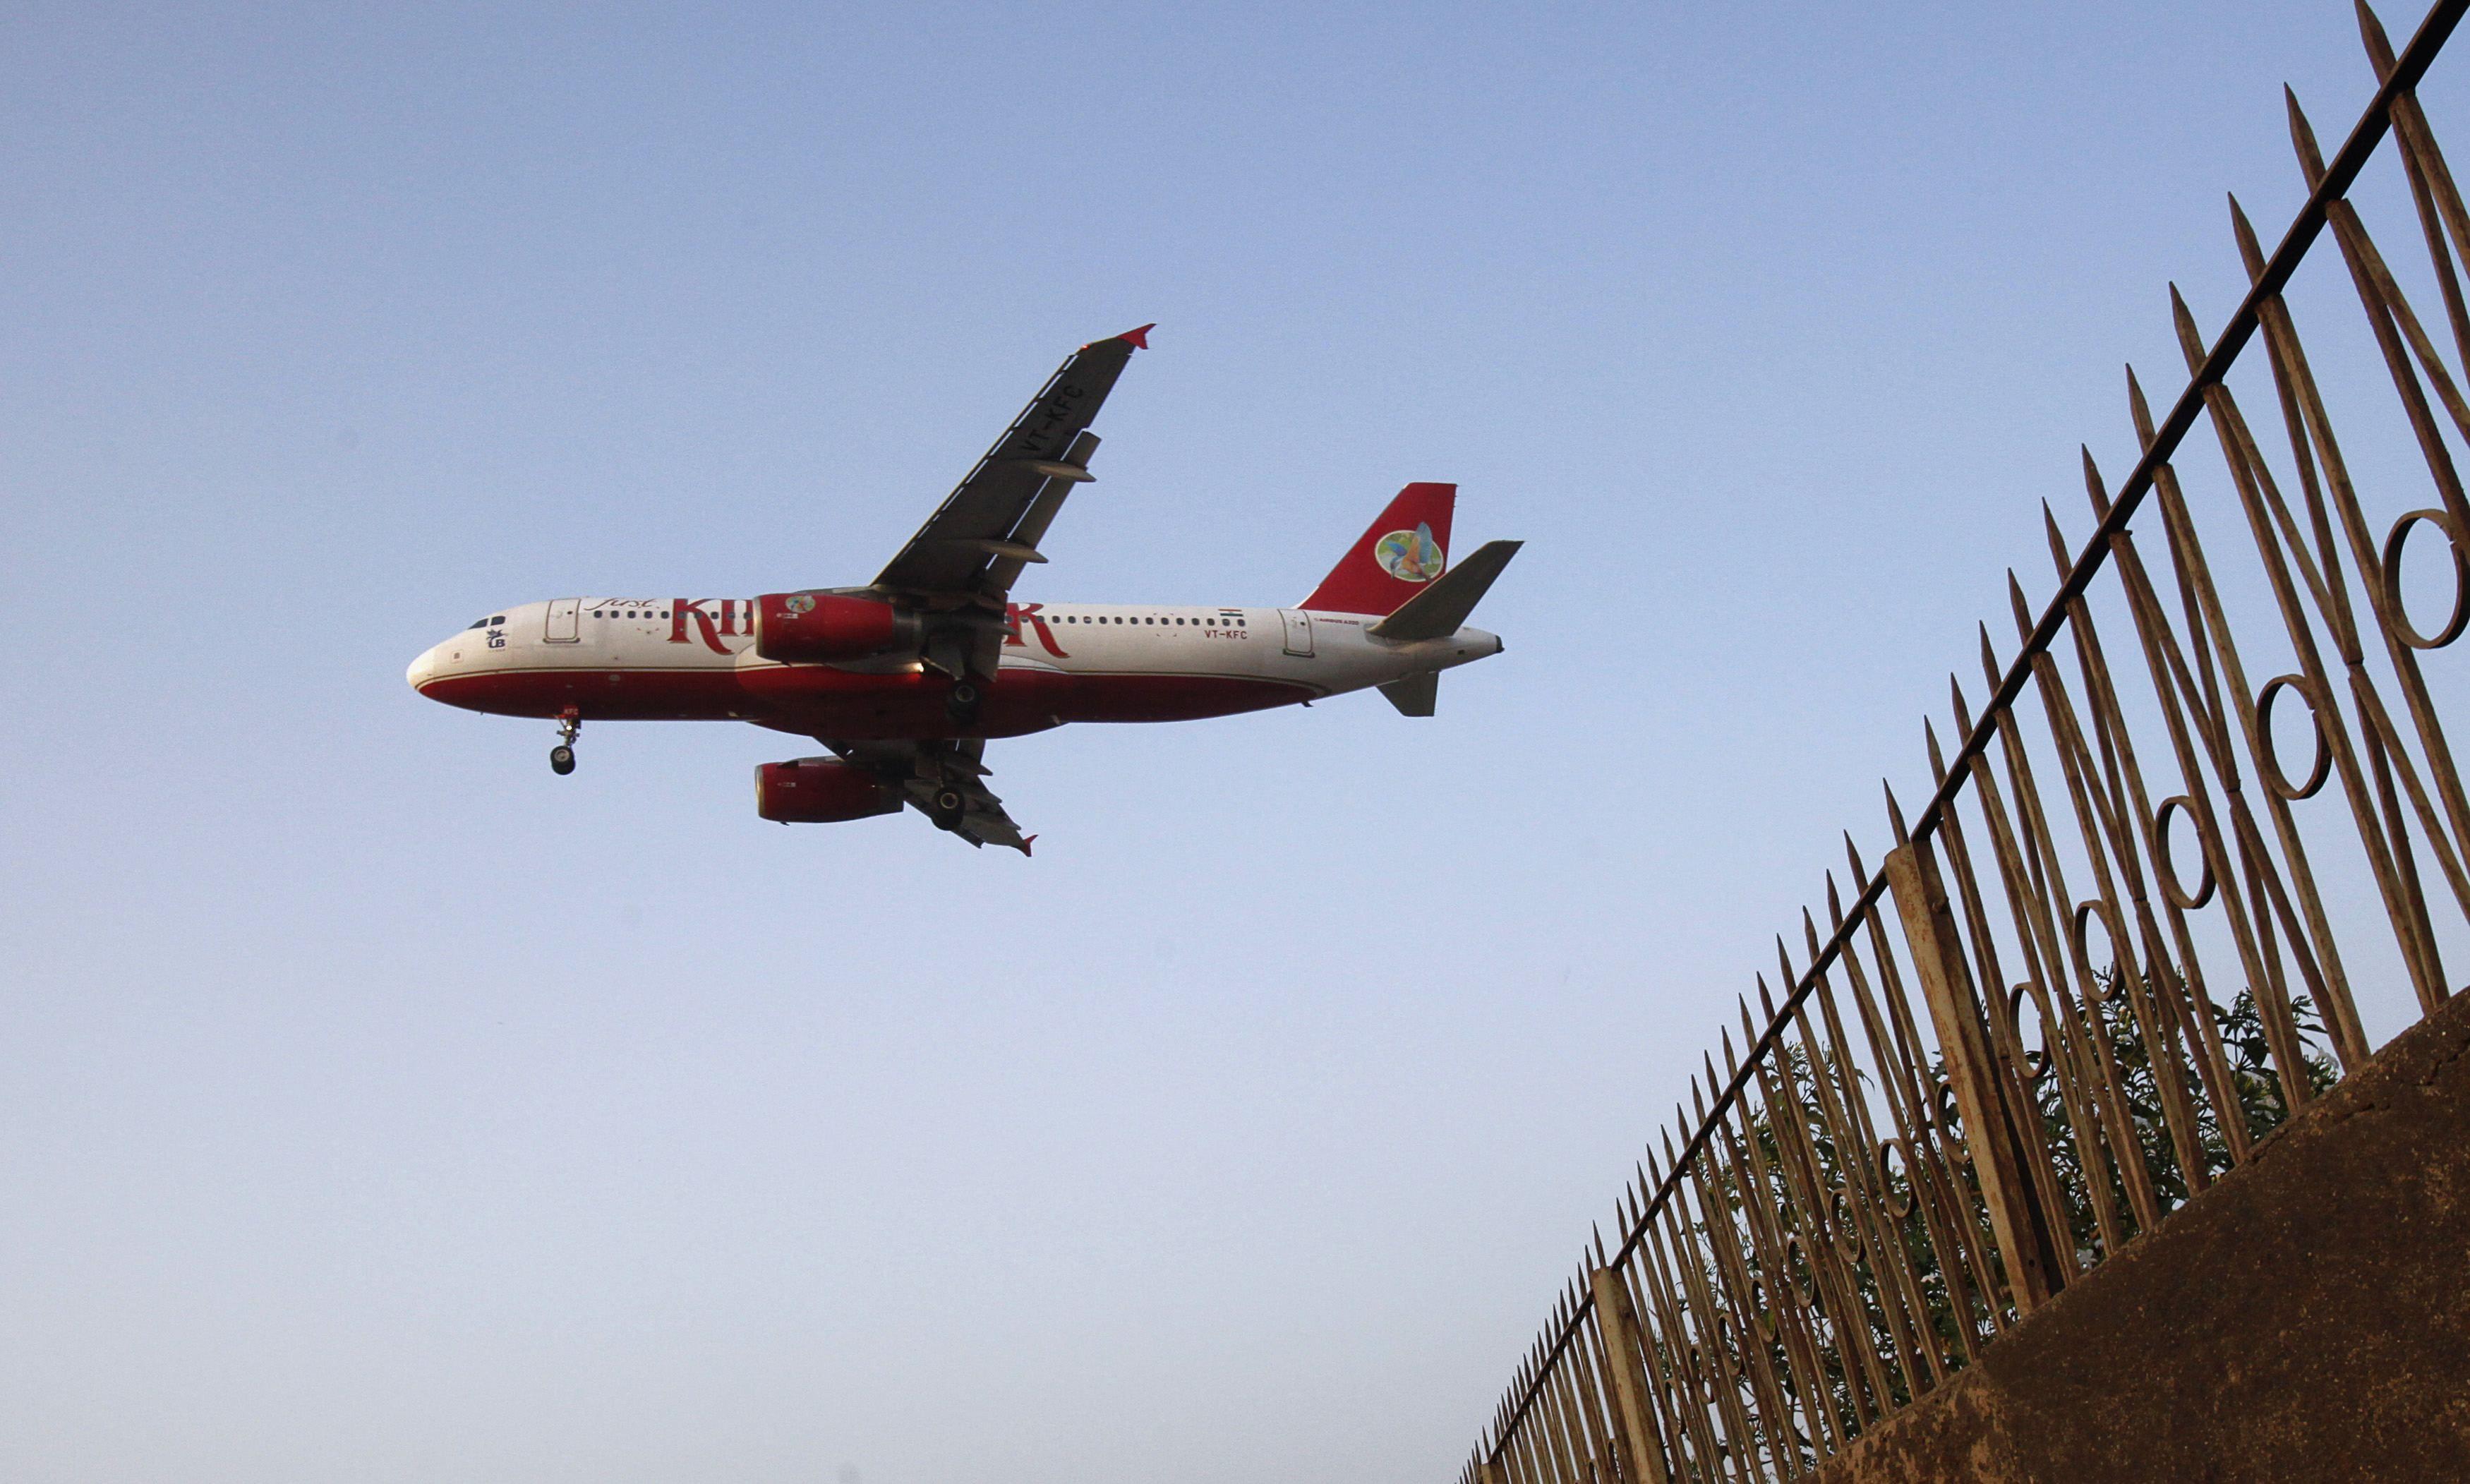 India's strikehit Kingfisher to resume flights Mallya